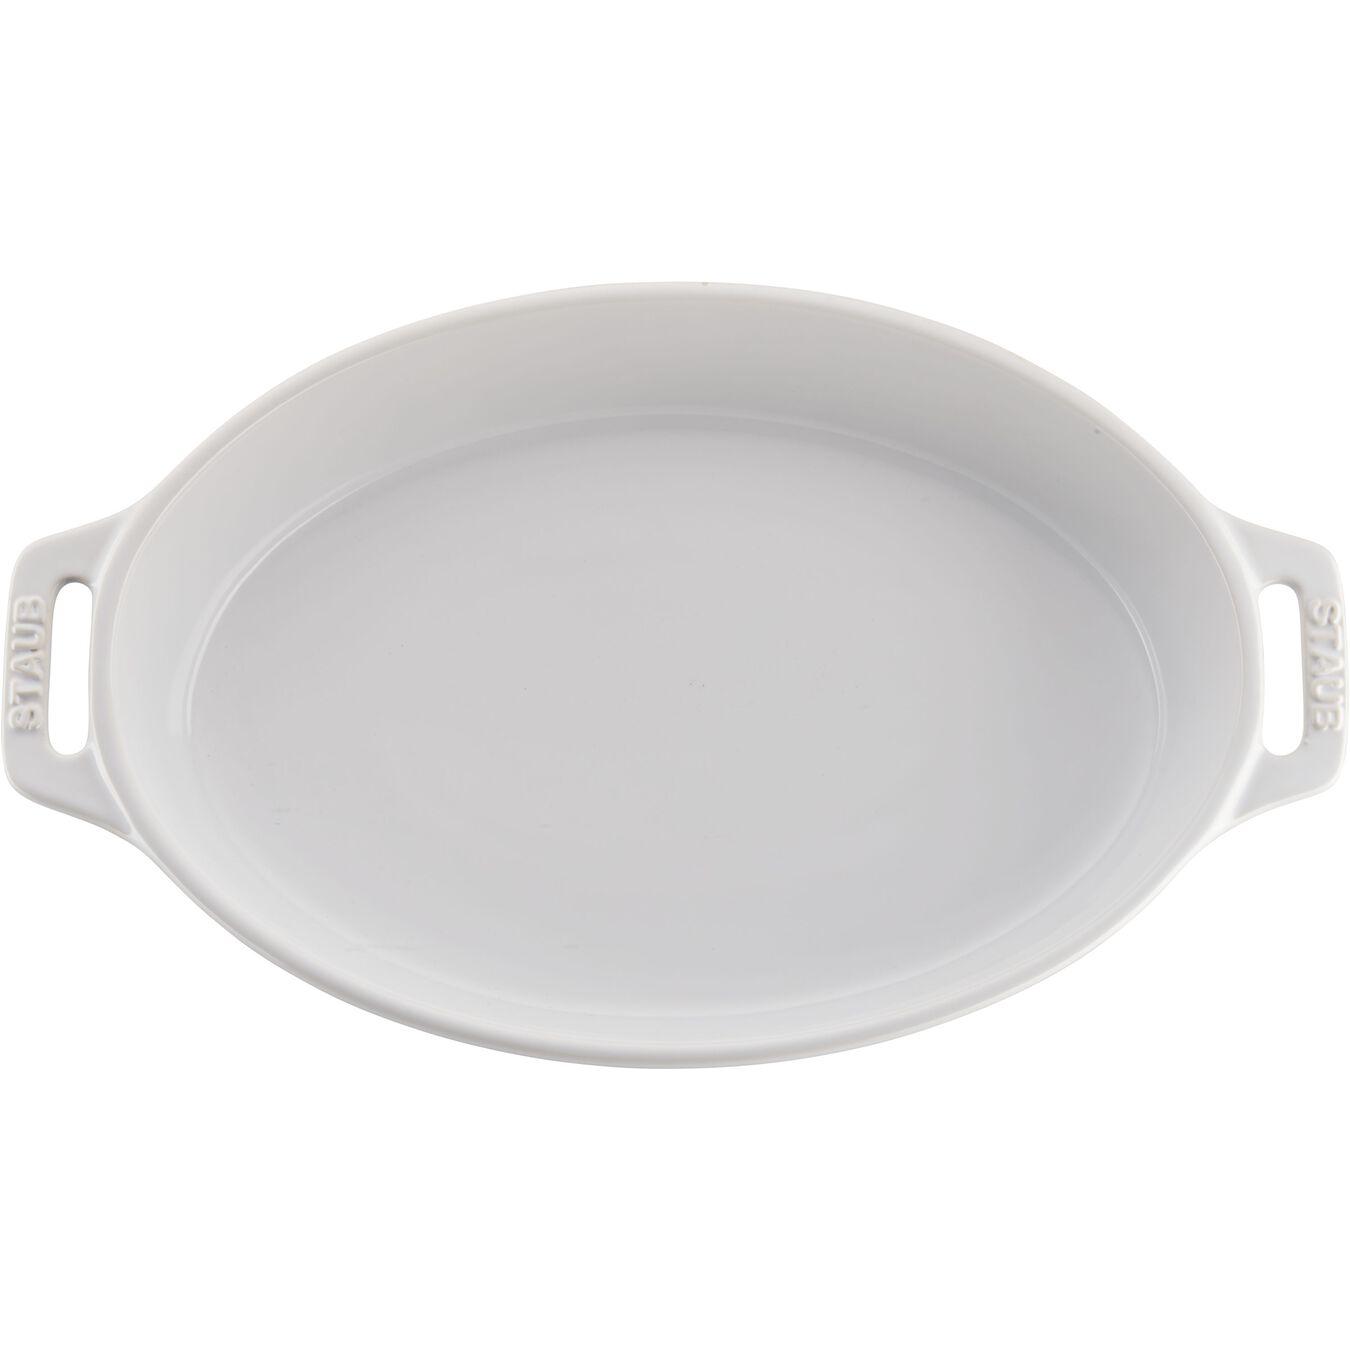 2-pc, oval, Bakeware set, white,,large 2